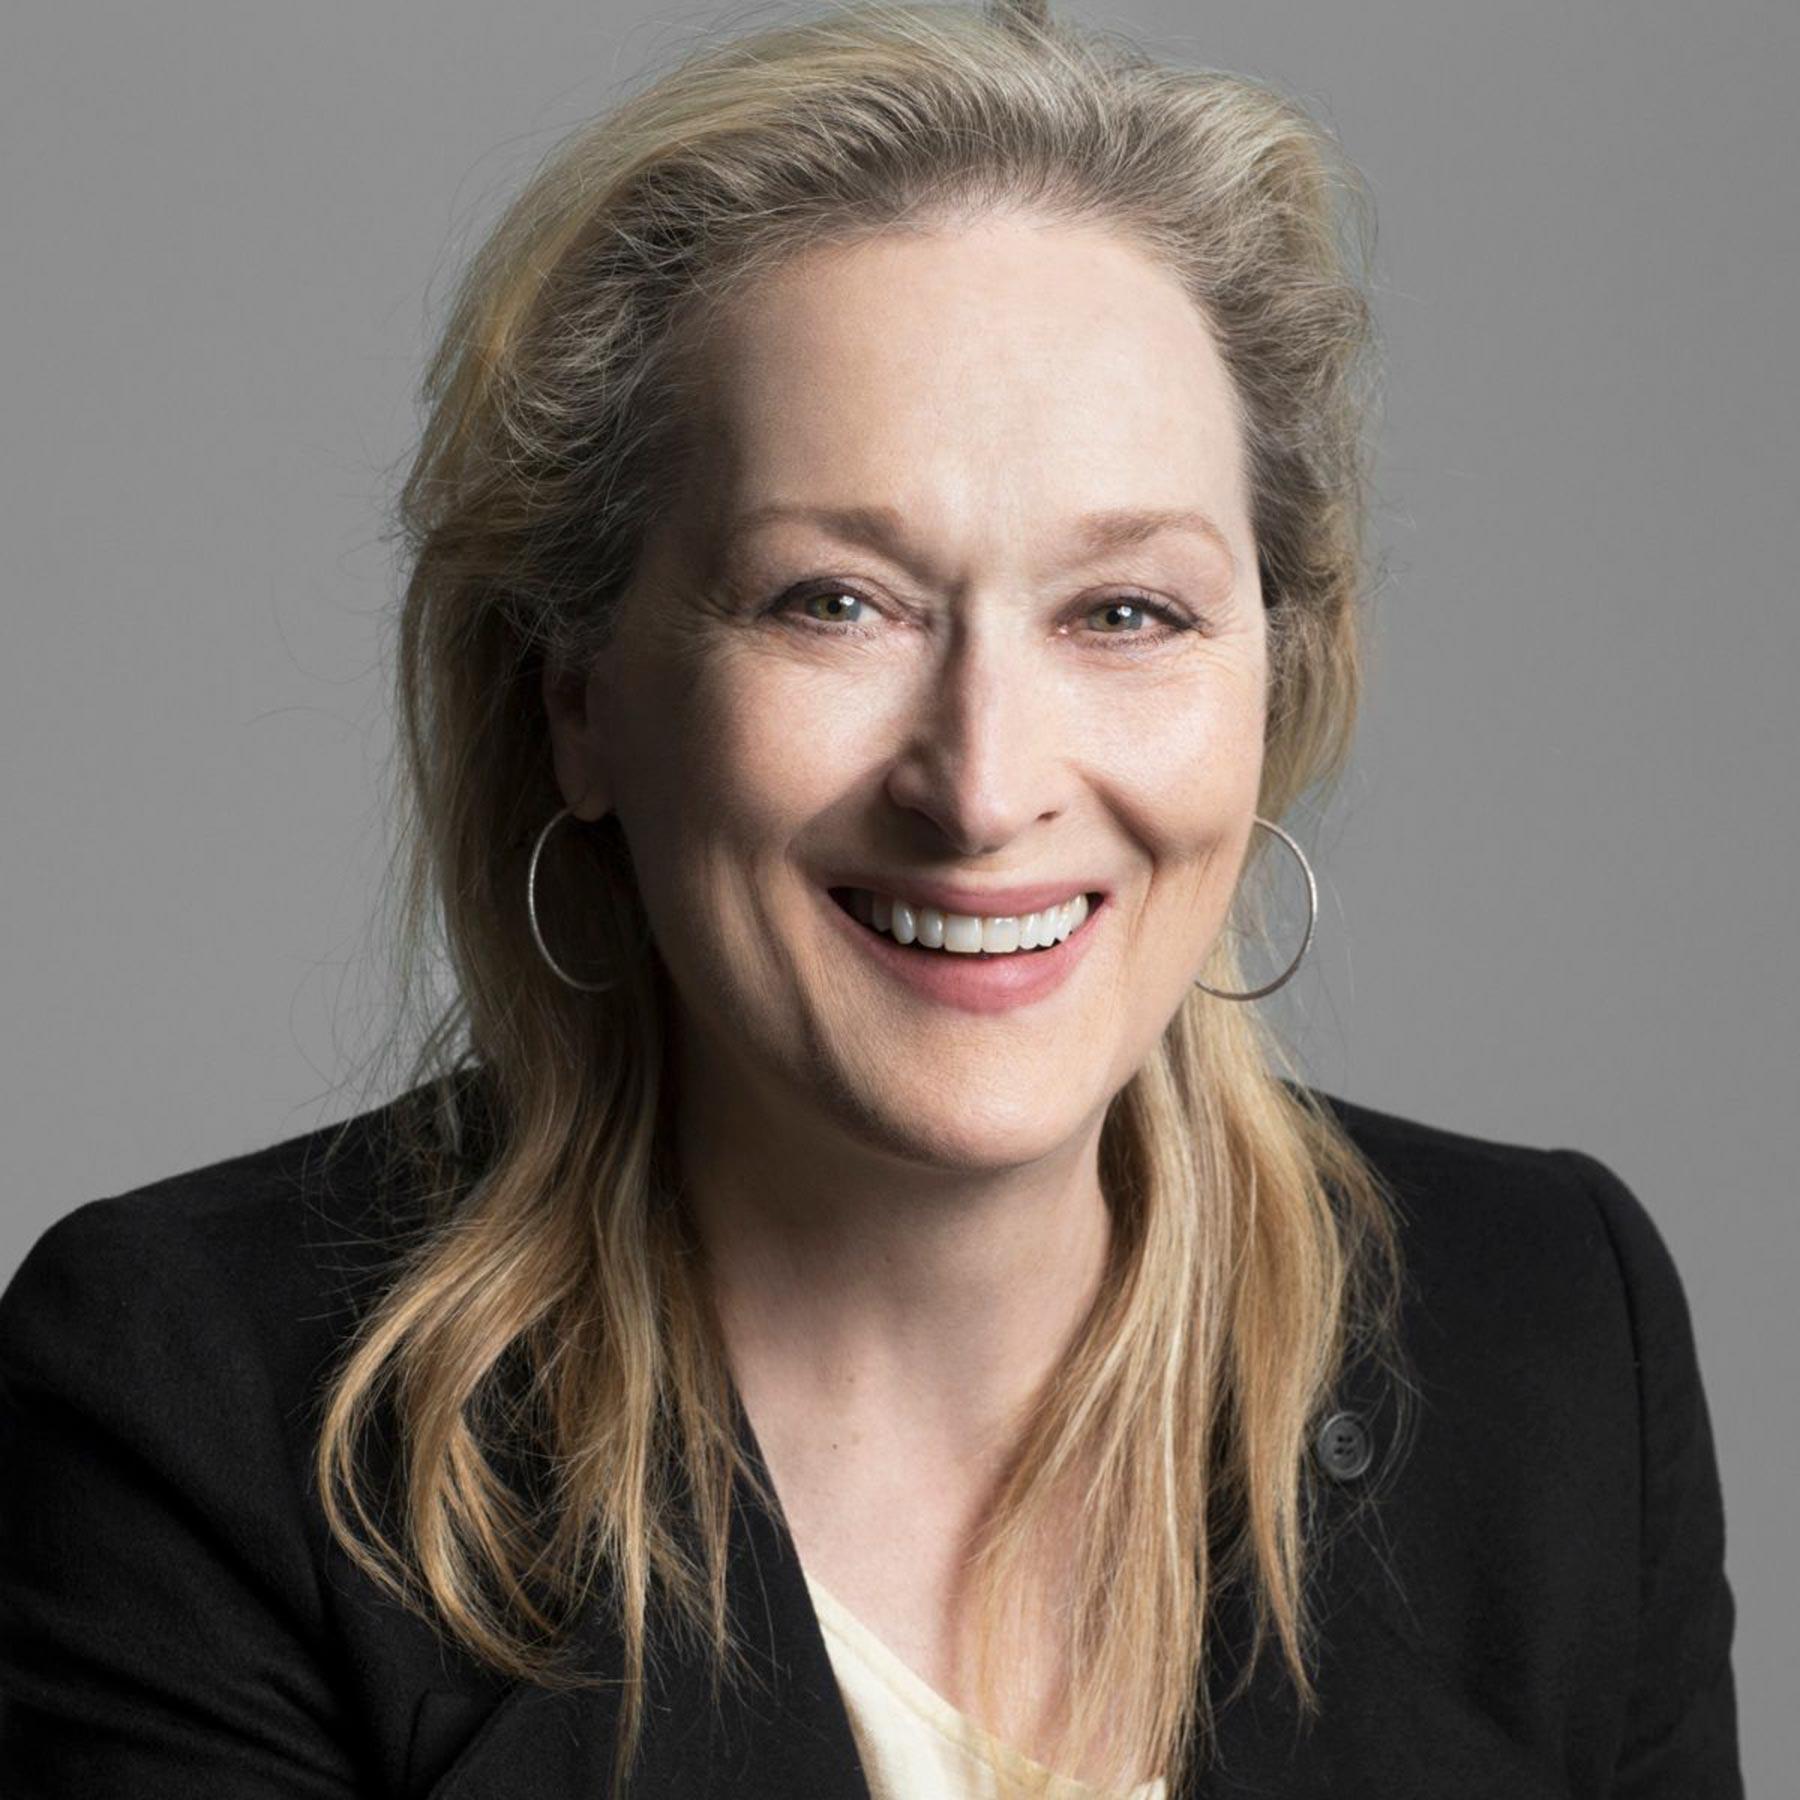 Meryl Streep to receive Toronto International Film Festival's first Actor Award